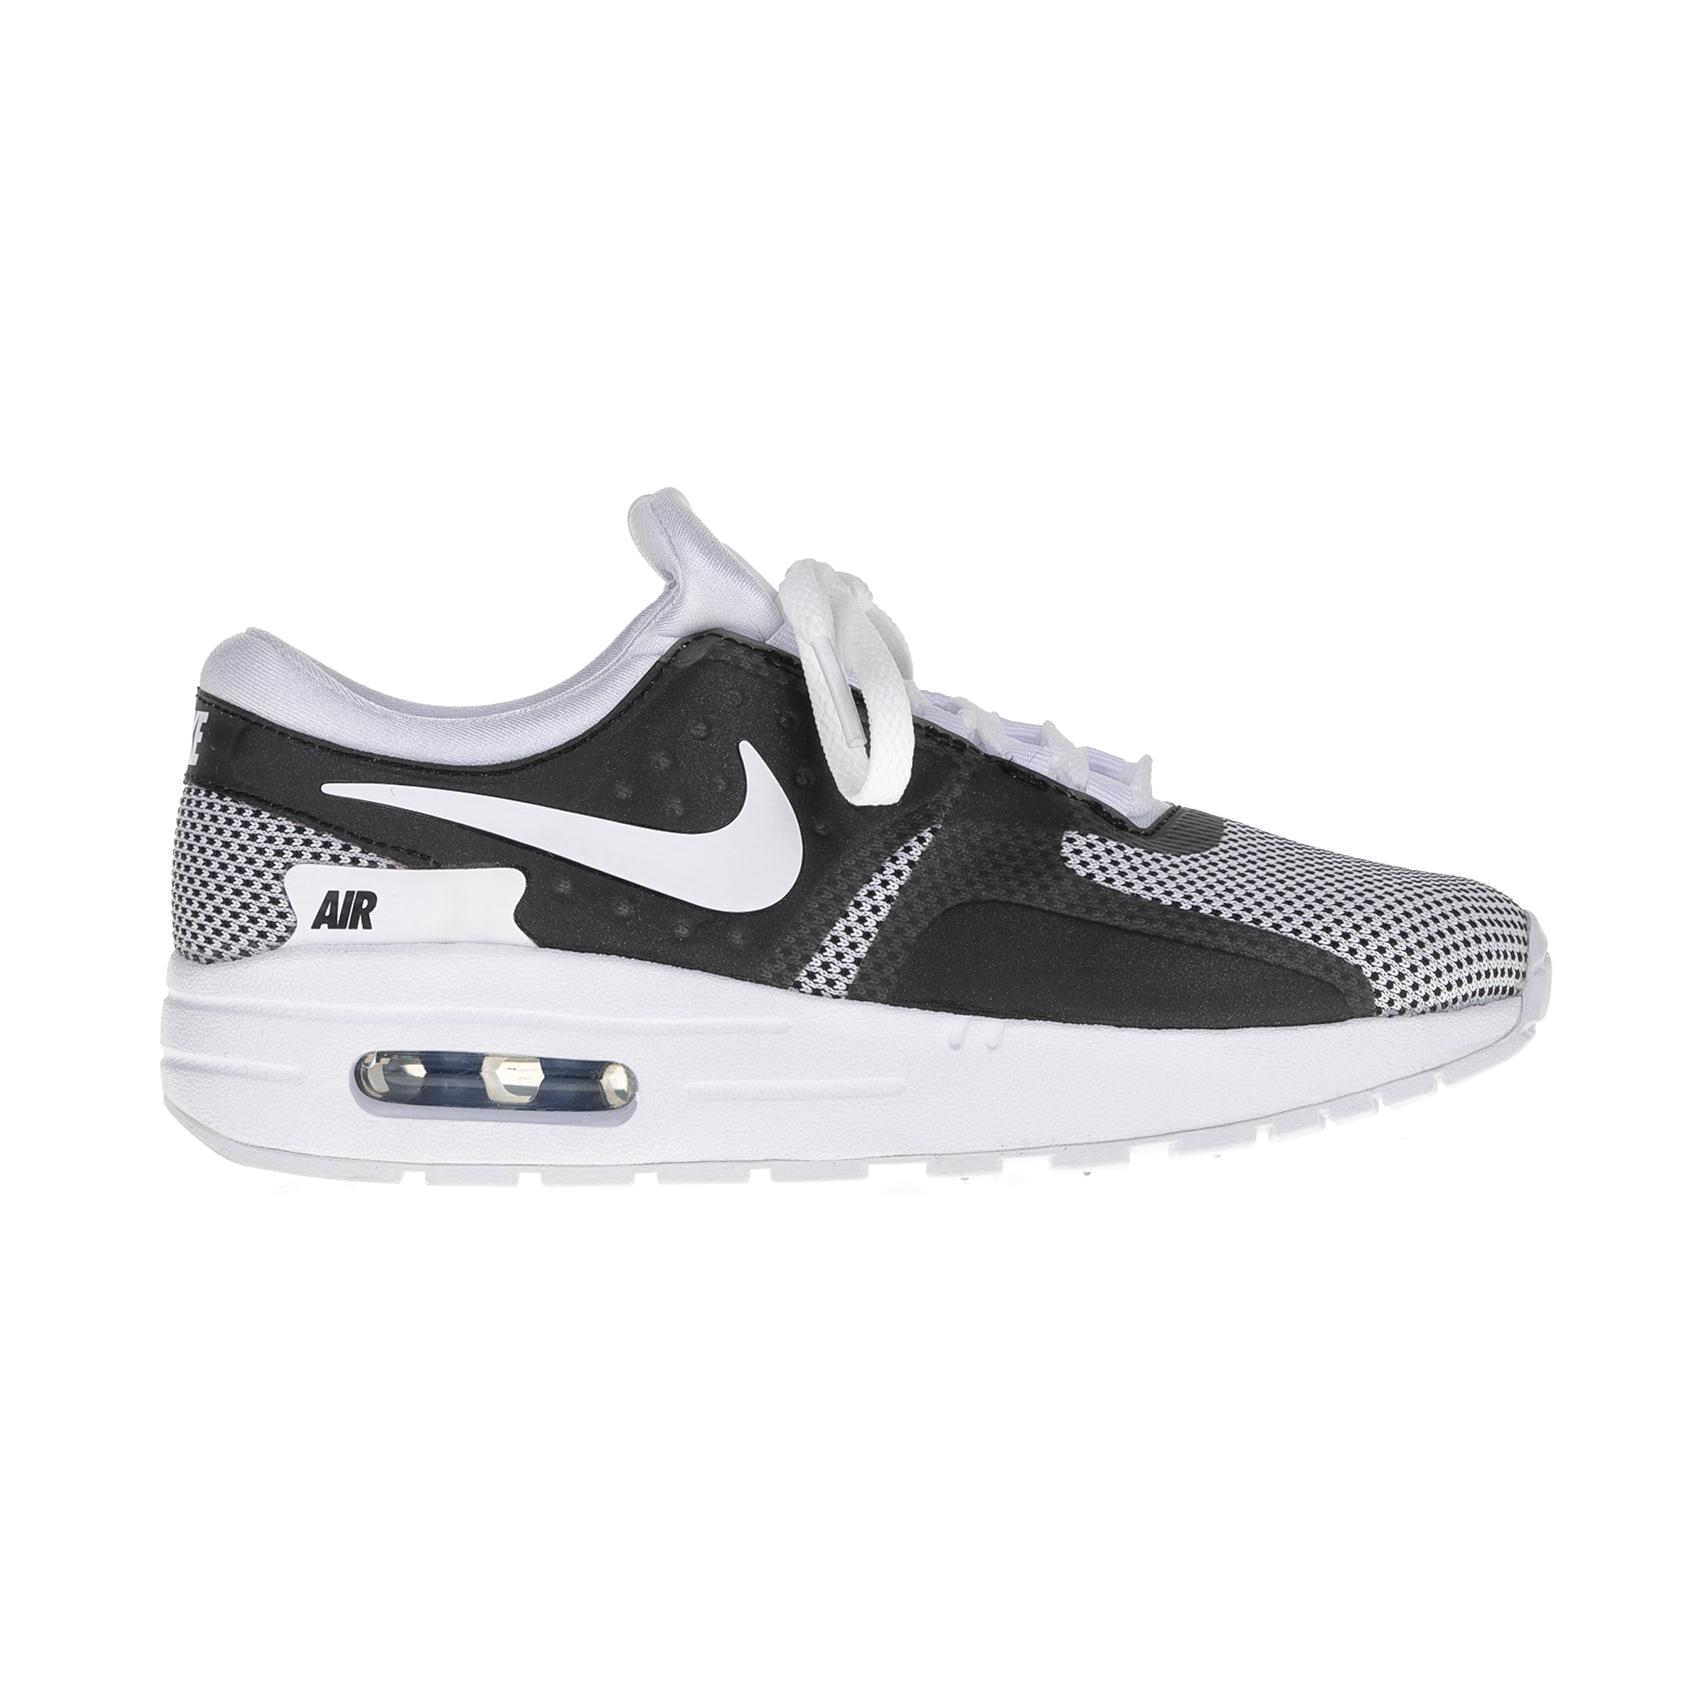 NIKE – Παιδικά αθλητικά παπούτσια Nike AIR MAX ZERO ESSENTIAL PS άσπρα – μαύρα